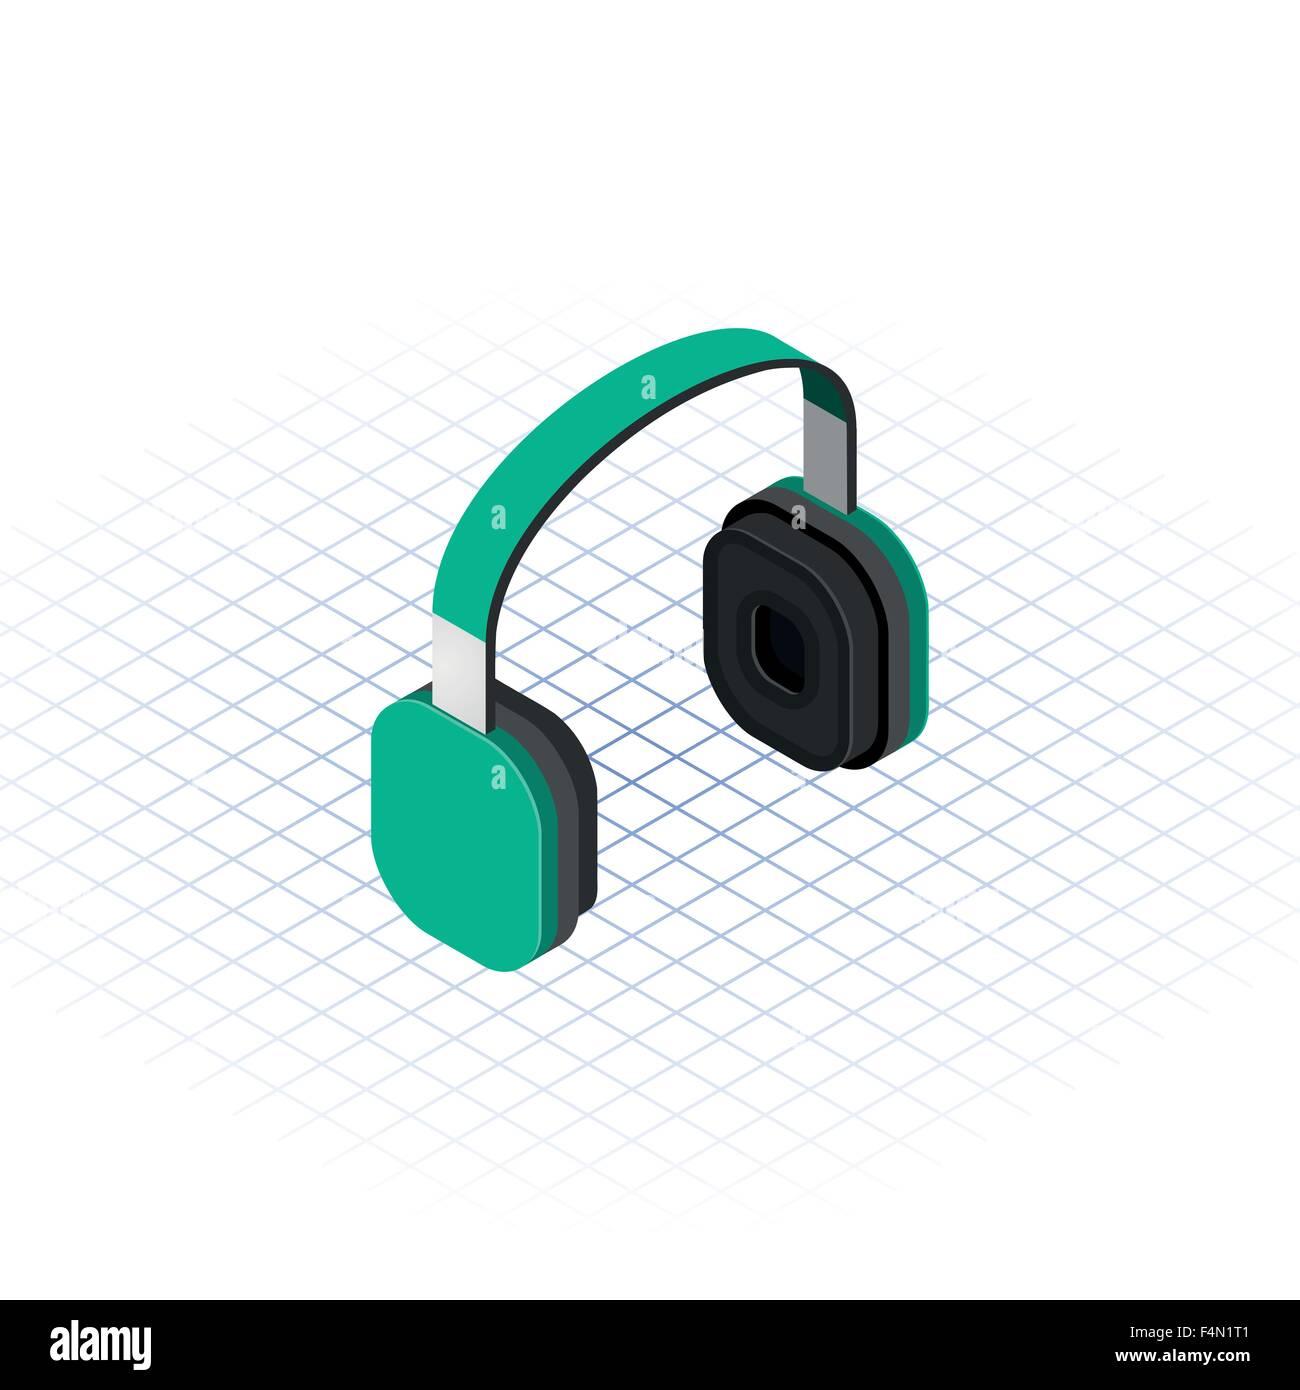 Isometric Headphone - Stock Image